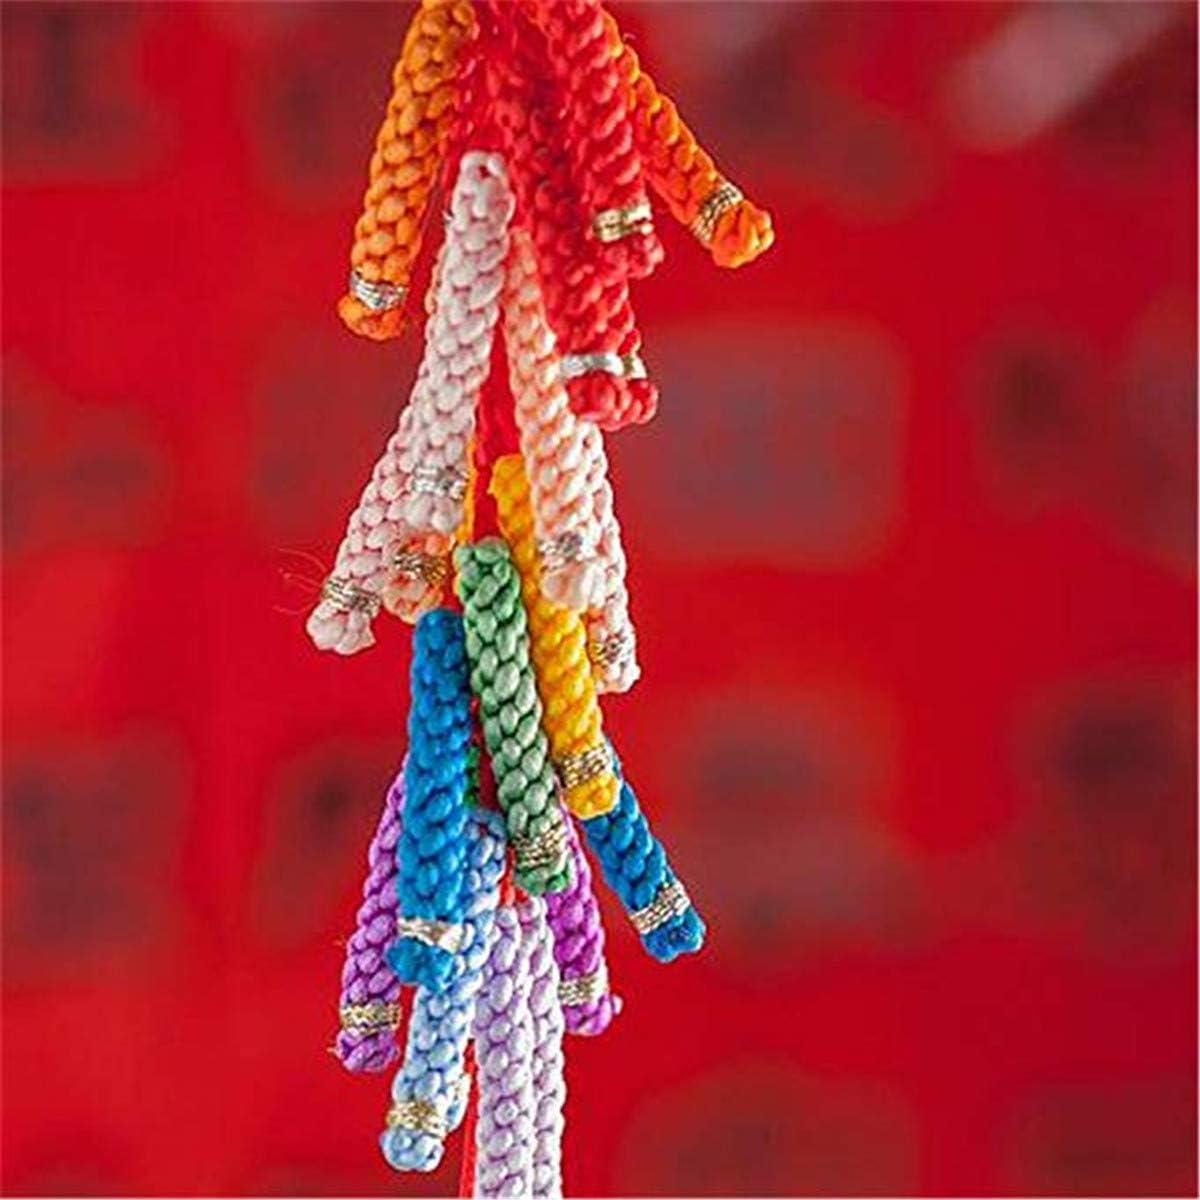 HLLbuy 2.5mm Dia 109Yd Black Satin Cord DIY Rattail Satin Nylon Trim Cord Chinese Knot